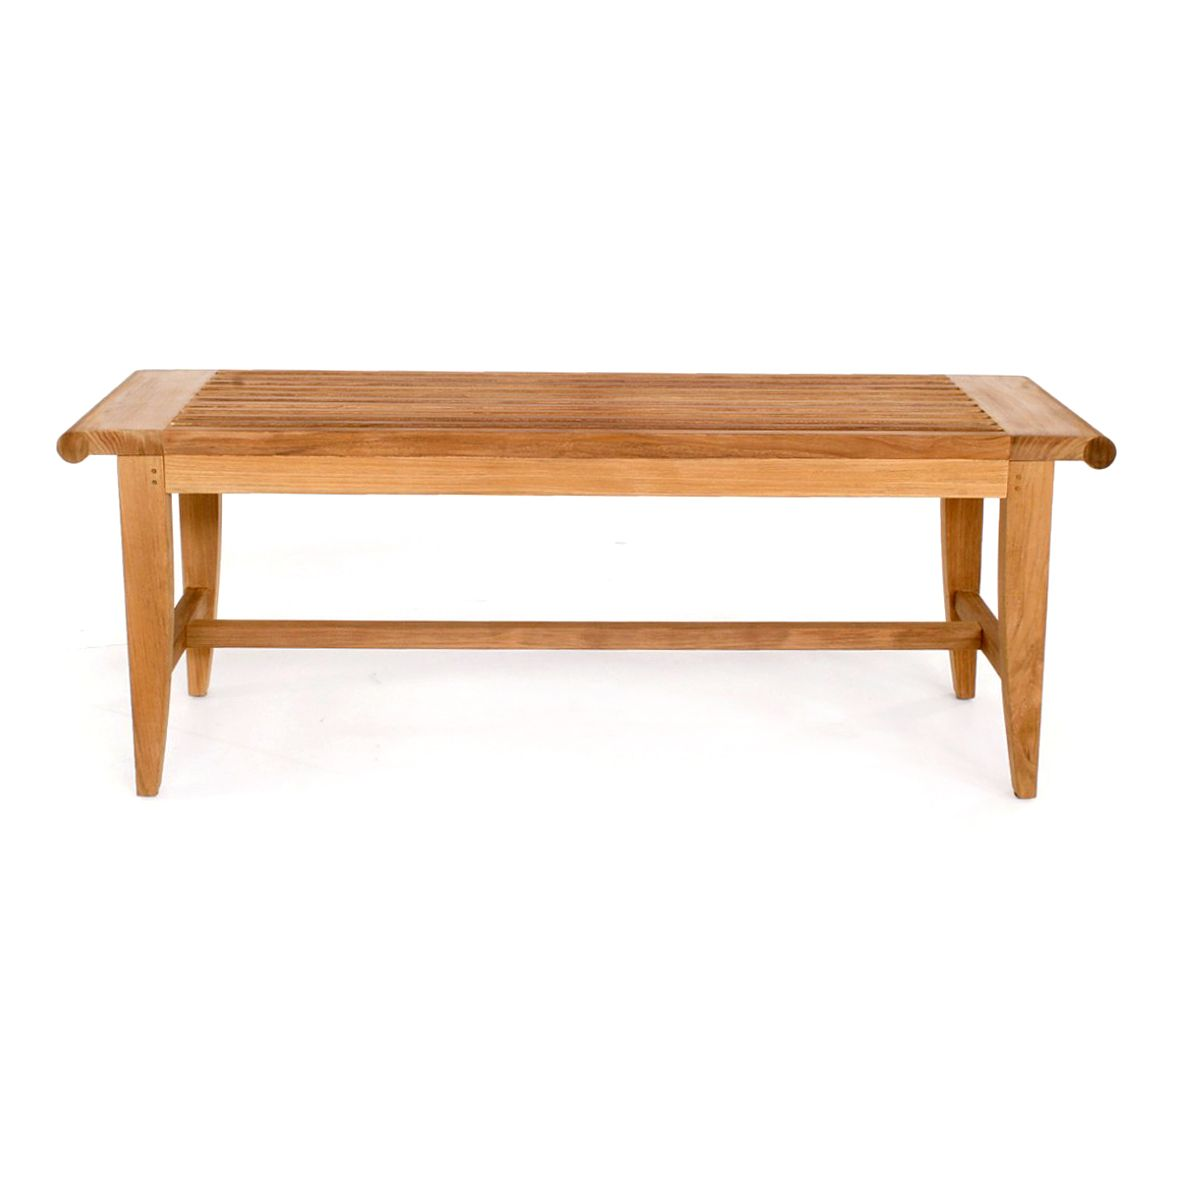 4 Ft Laguna Teak Backless Bench Westminster Teak Teak Outdoor Furniture Teak